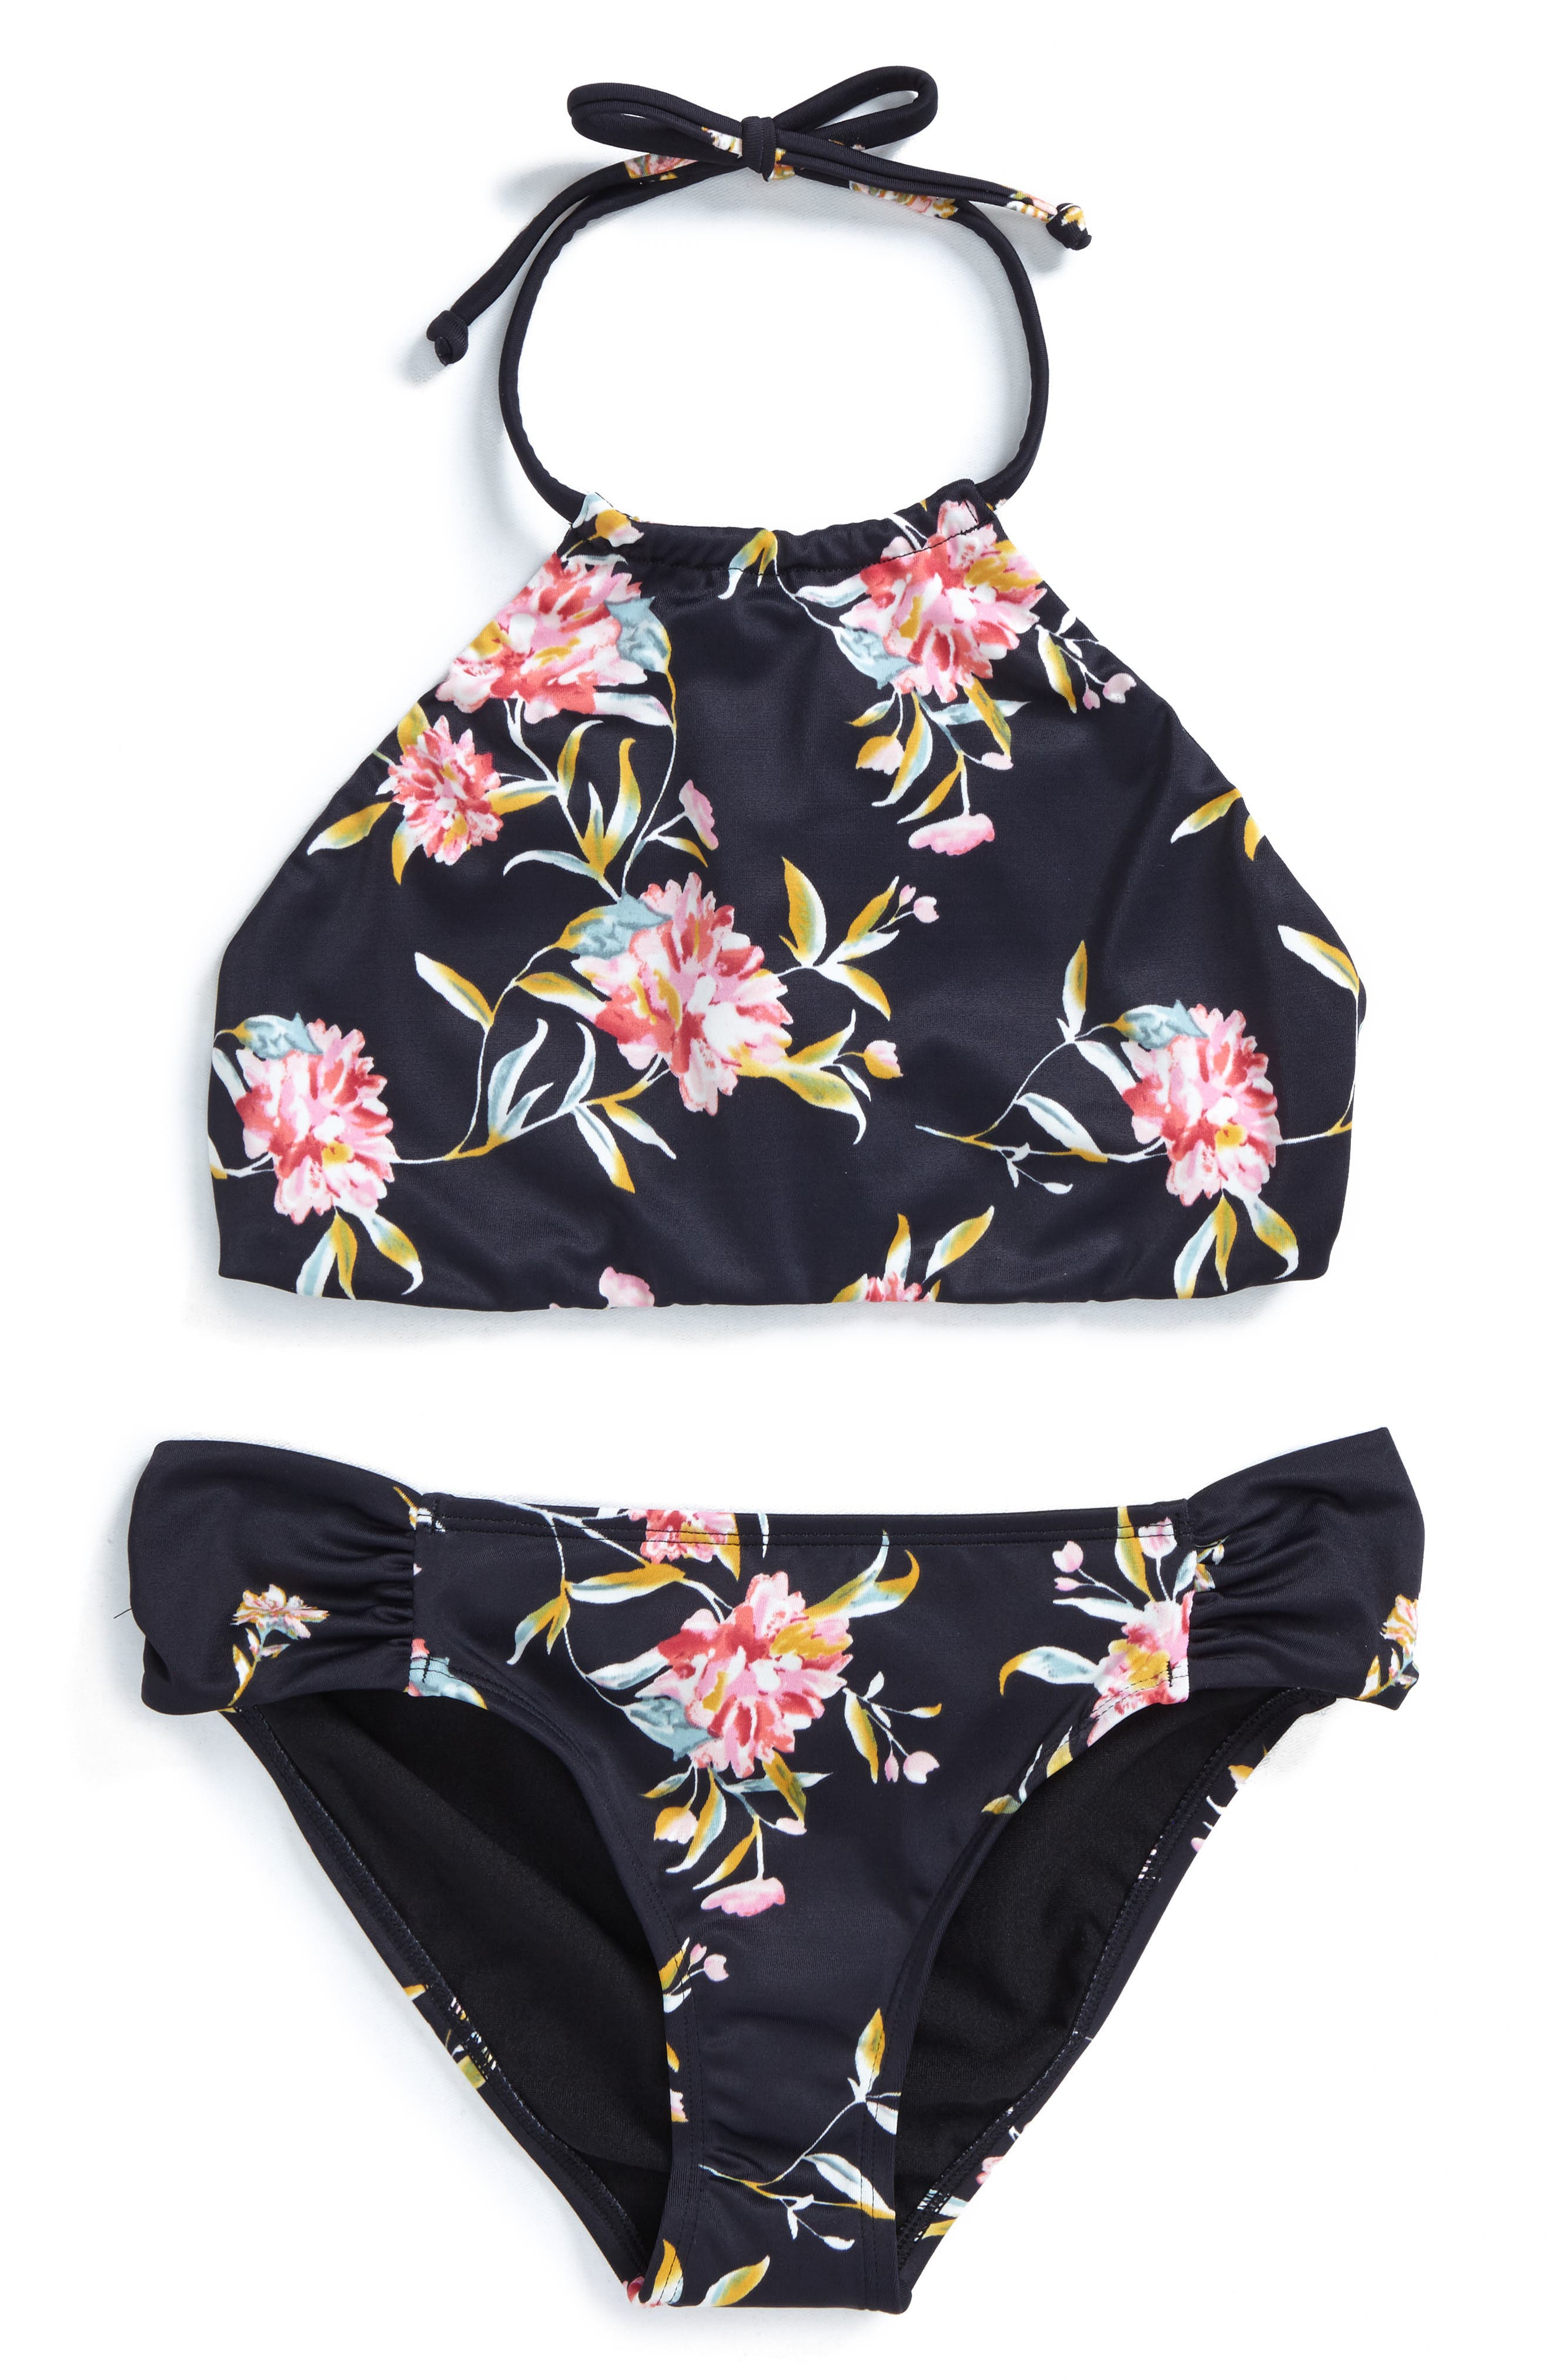 Via Rosa Two-Piece Halter Swimsuit,                         Main,                         color, 007